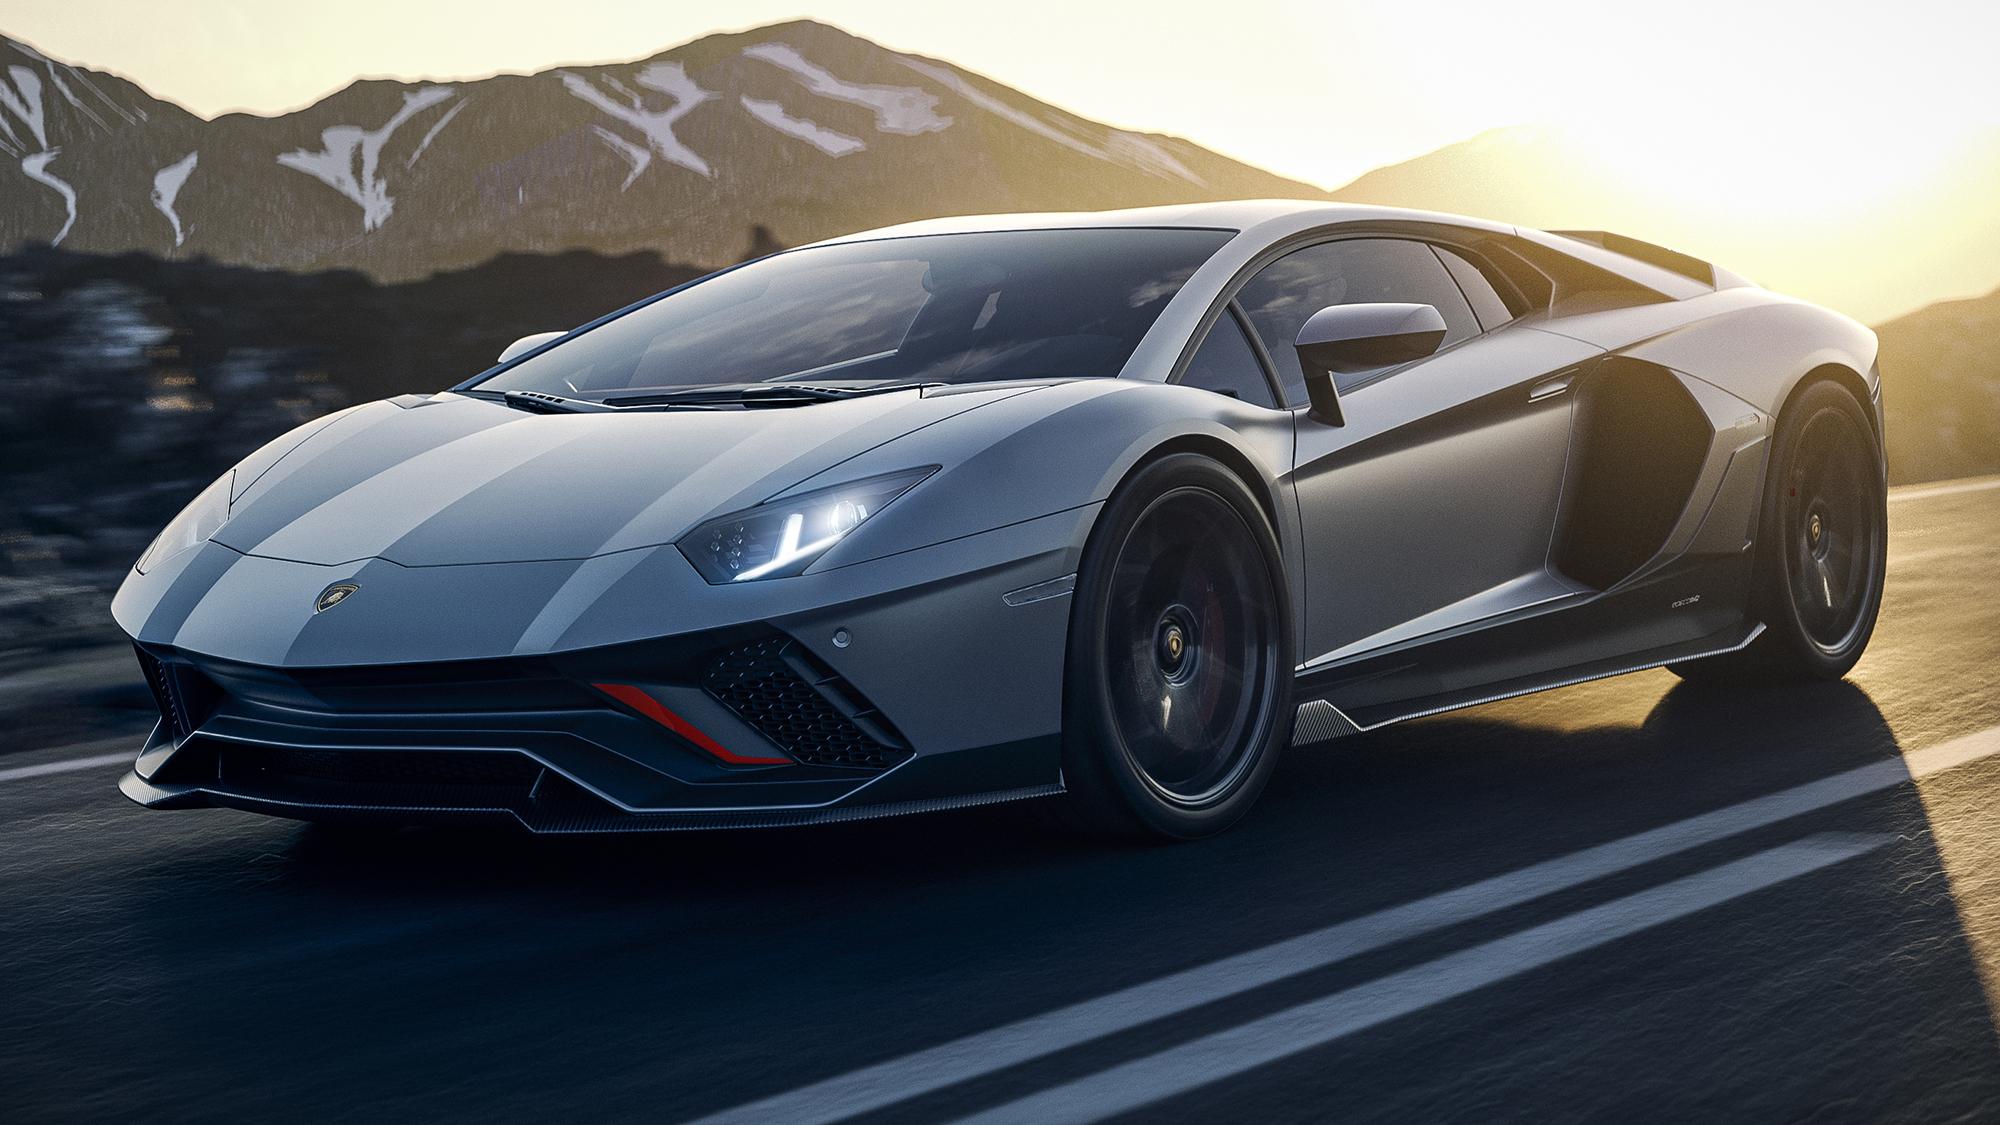 Lamborghini Aventador Ultimae prata visto de frente